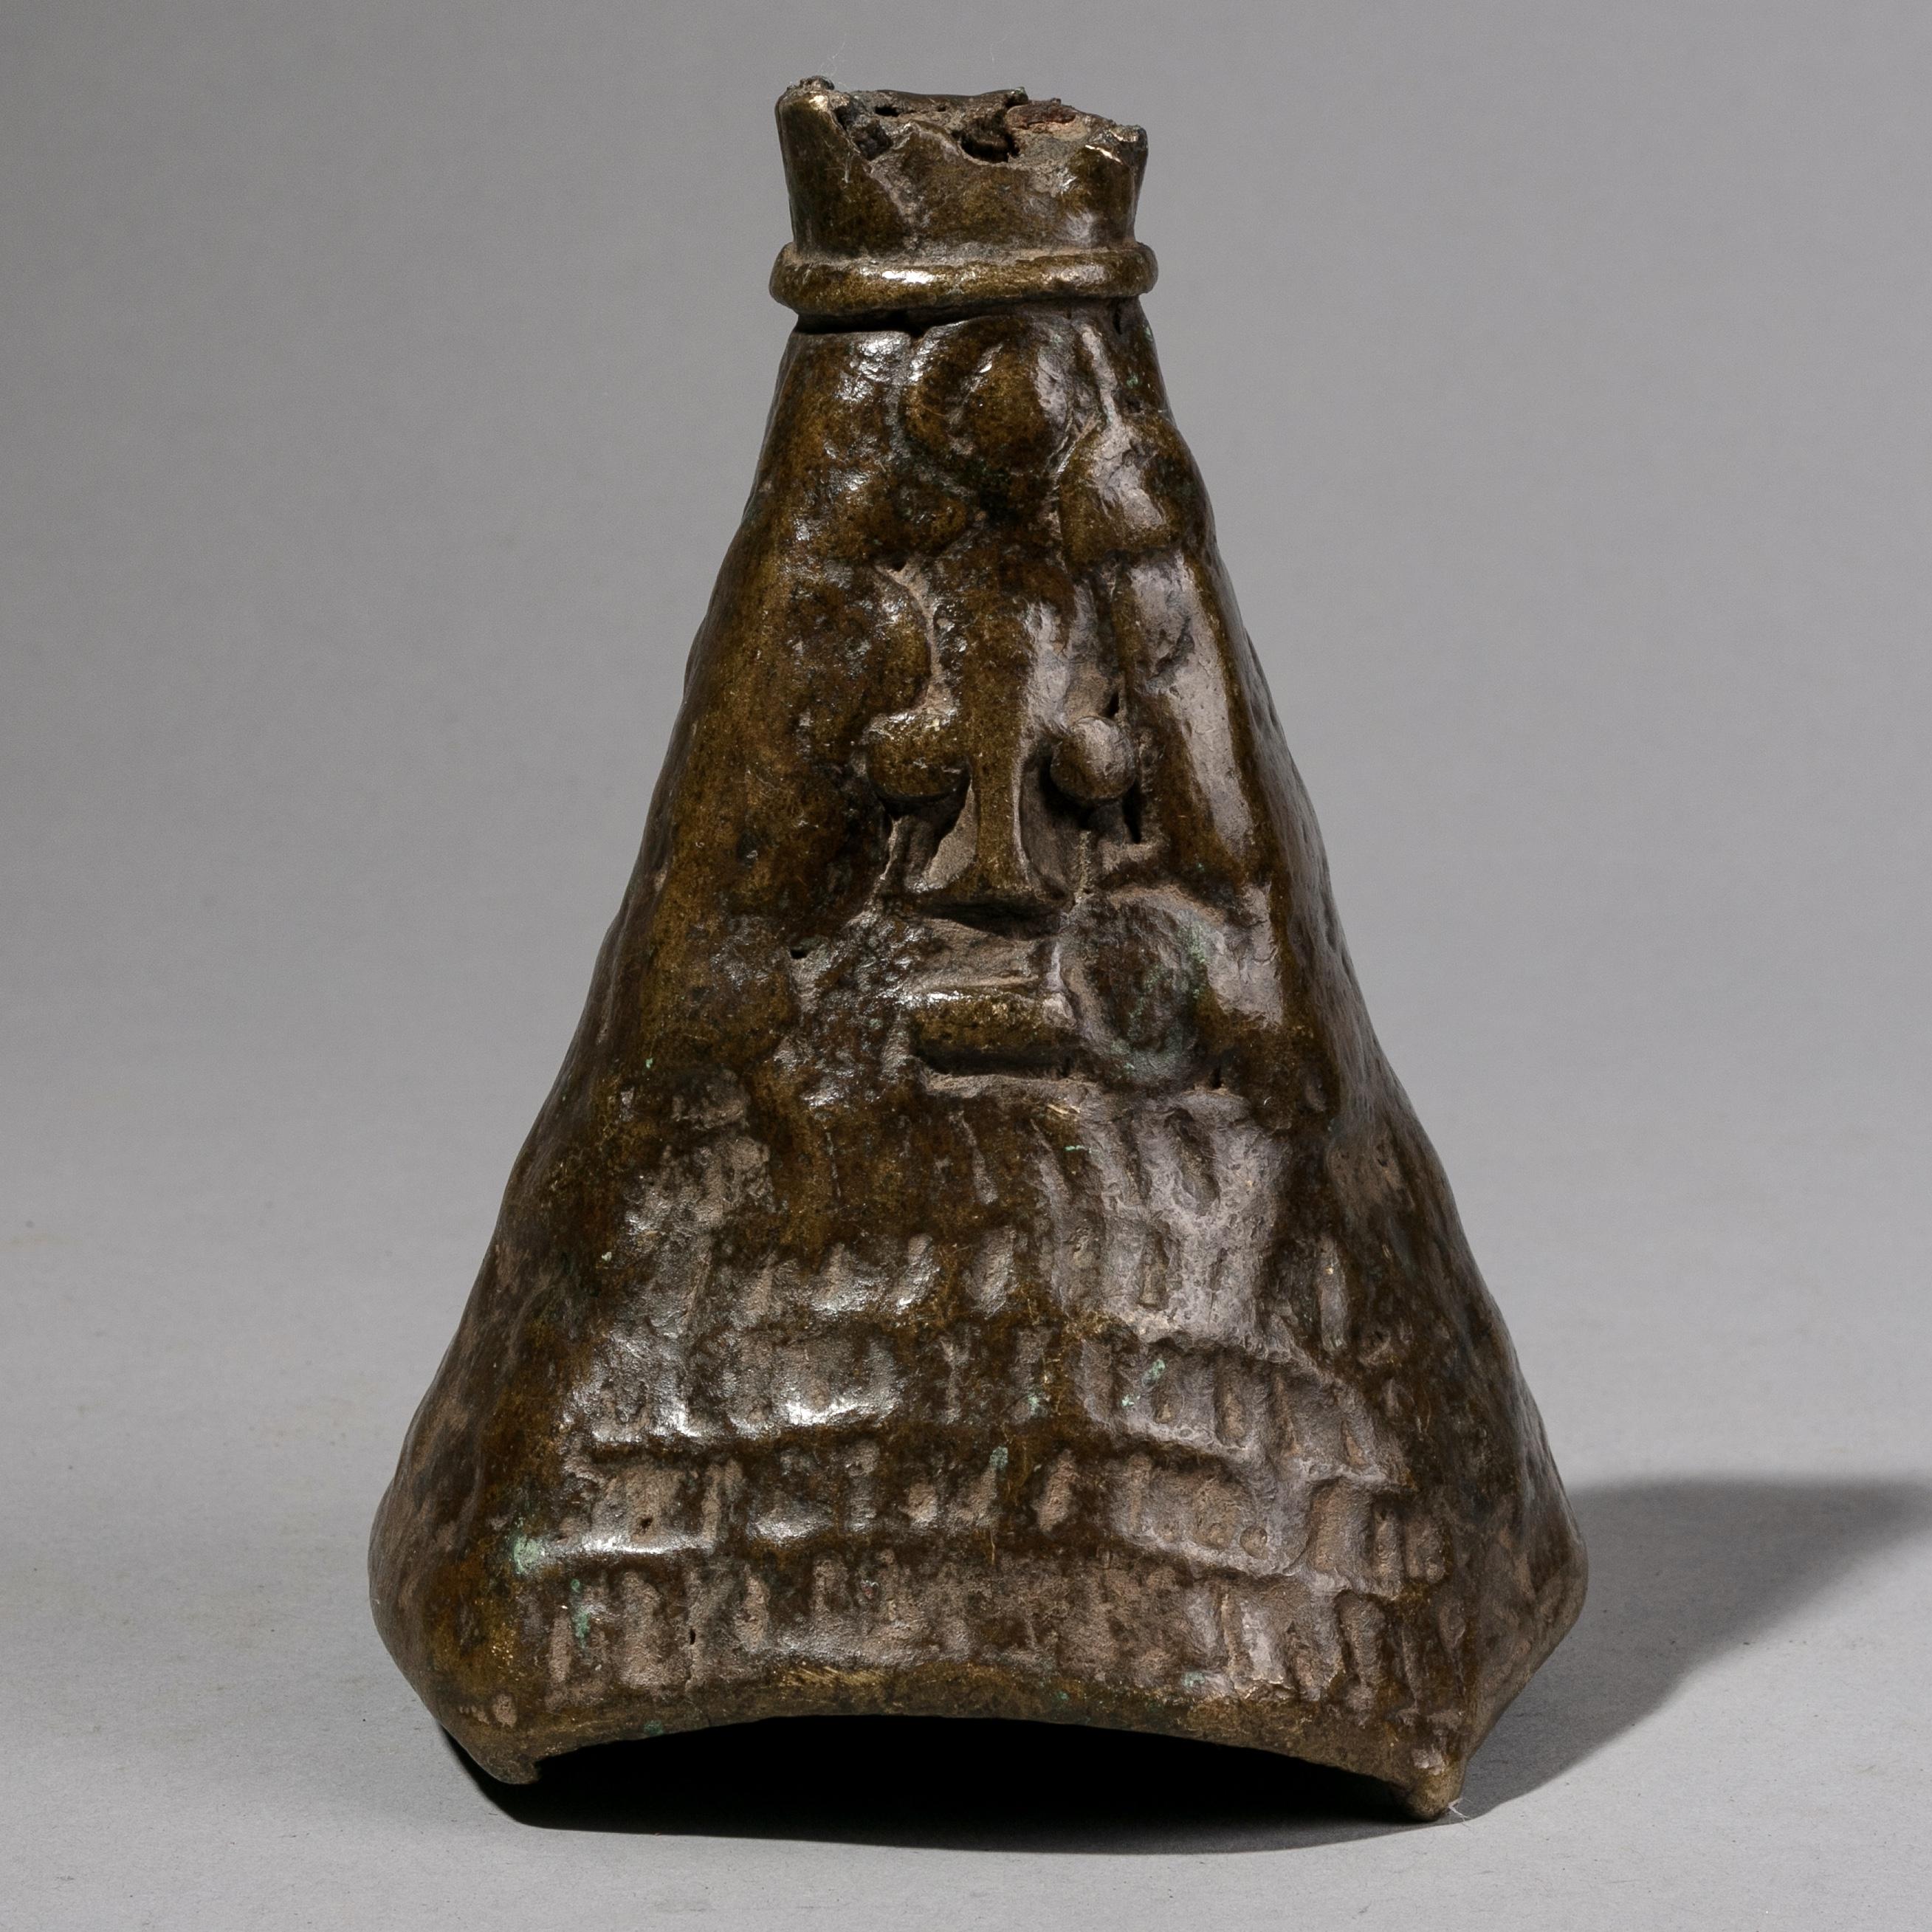 SD AN ANTIQUE YORUBA  DIVINATION BELL WITH BUTTERY FEEL, NIGERIA ( No 1203 )